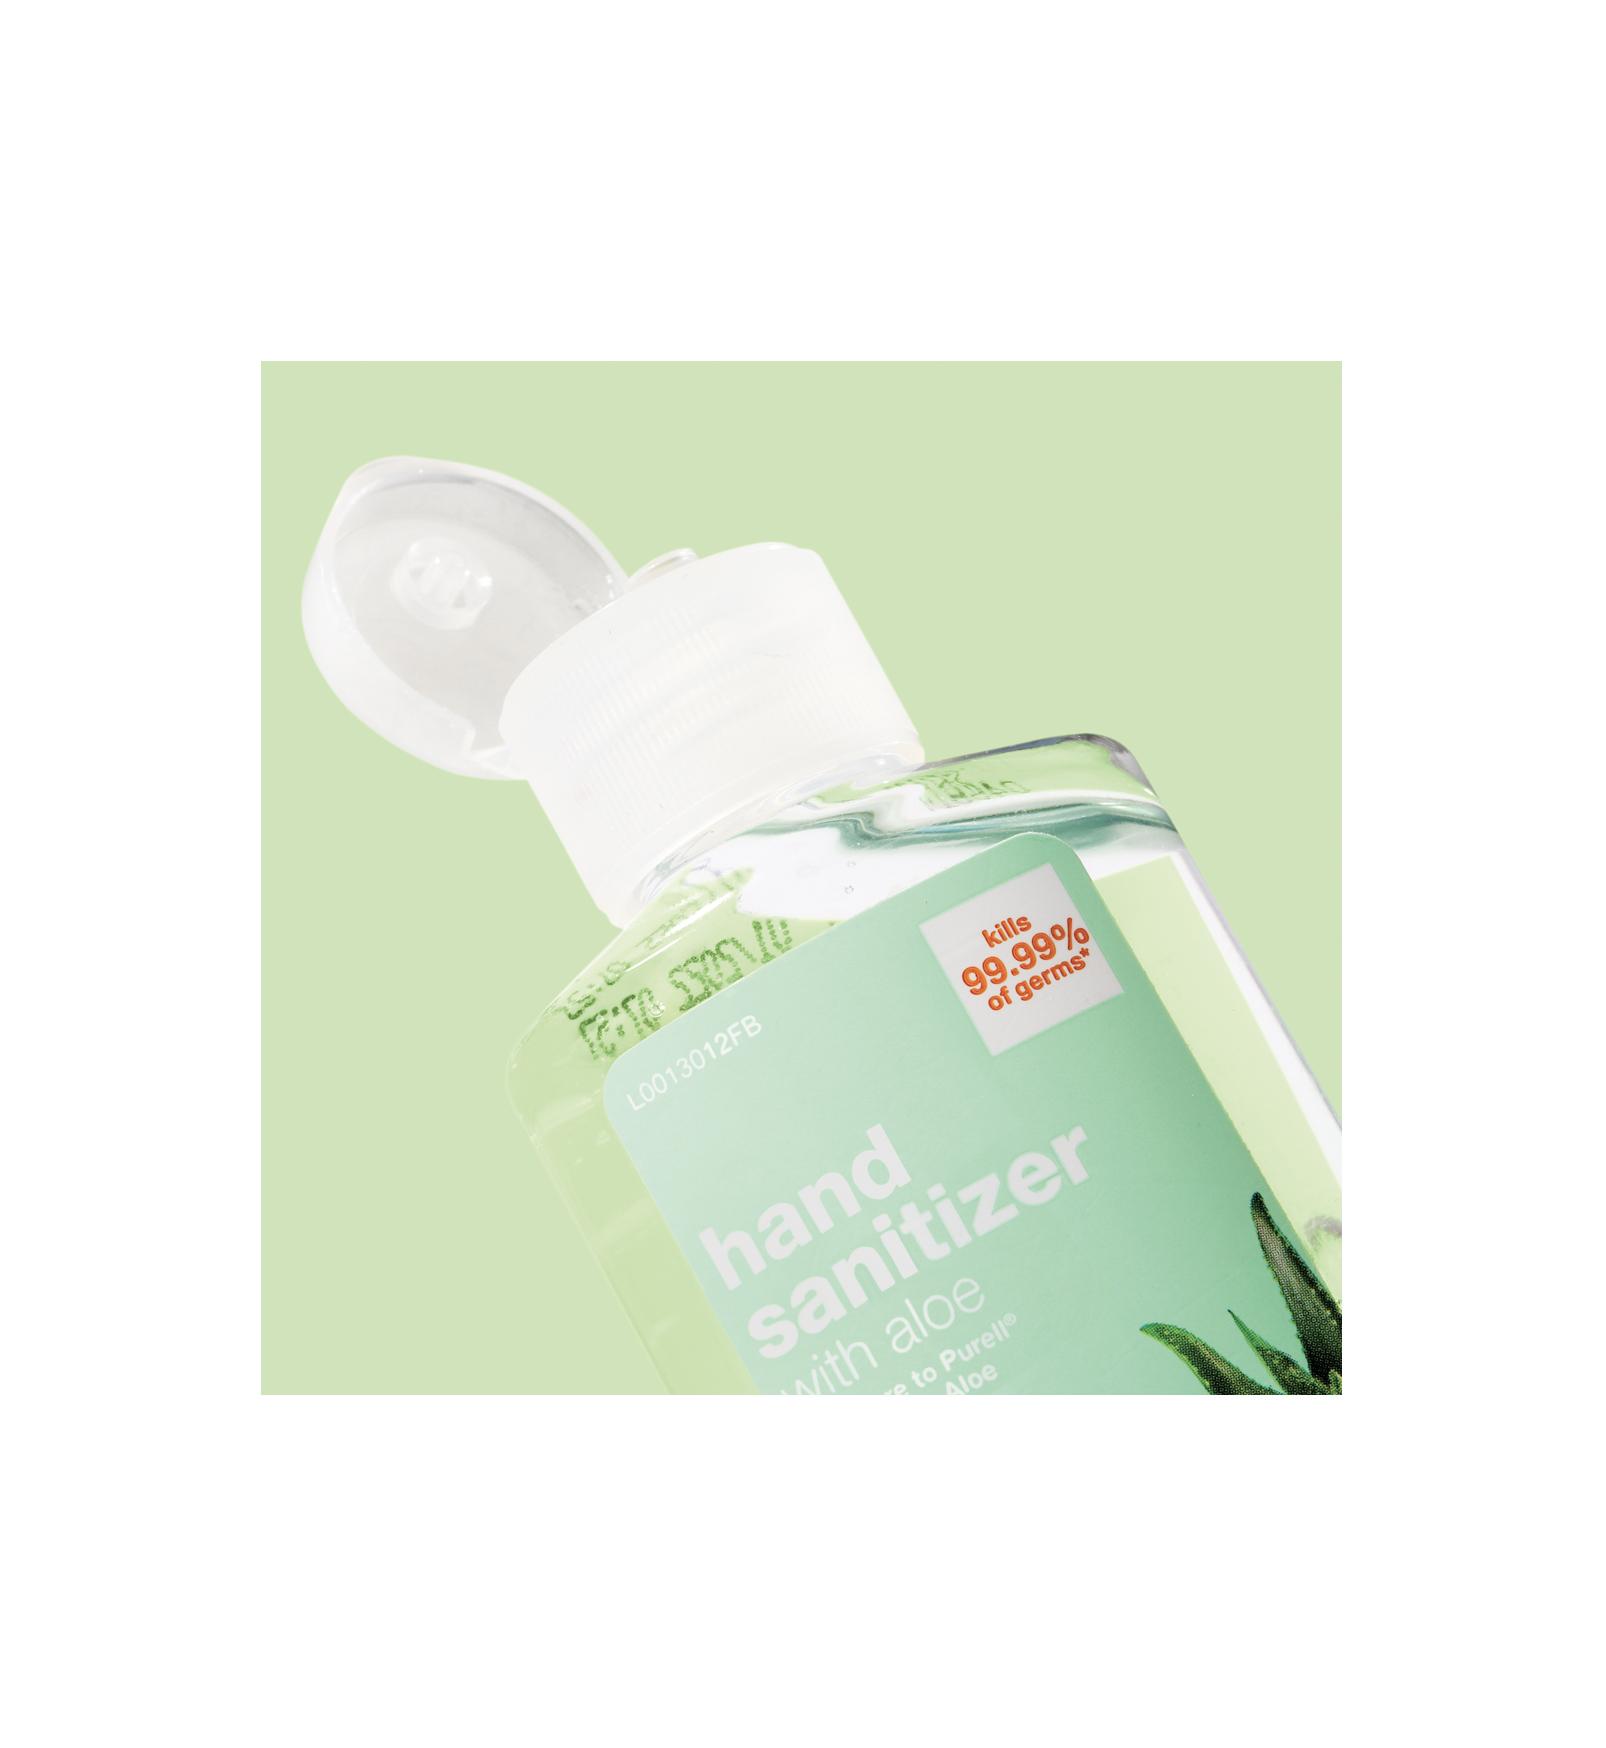 A hand sanitizer bottle.